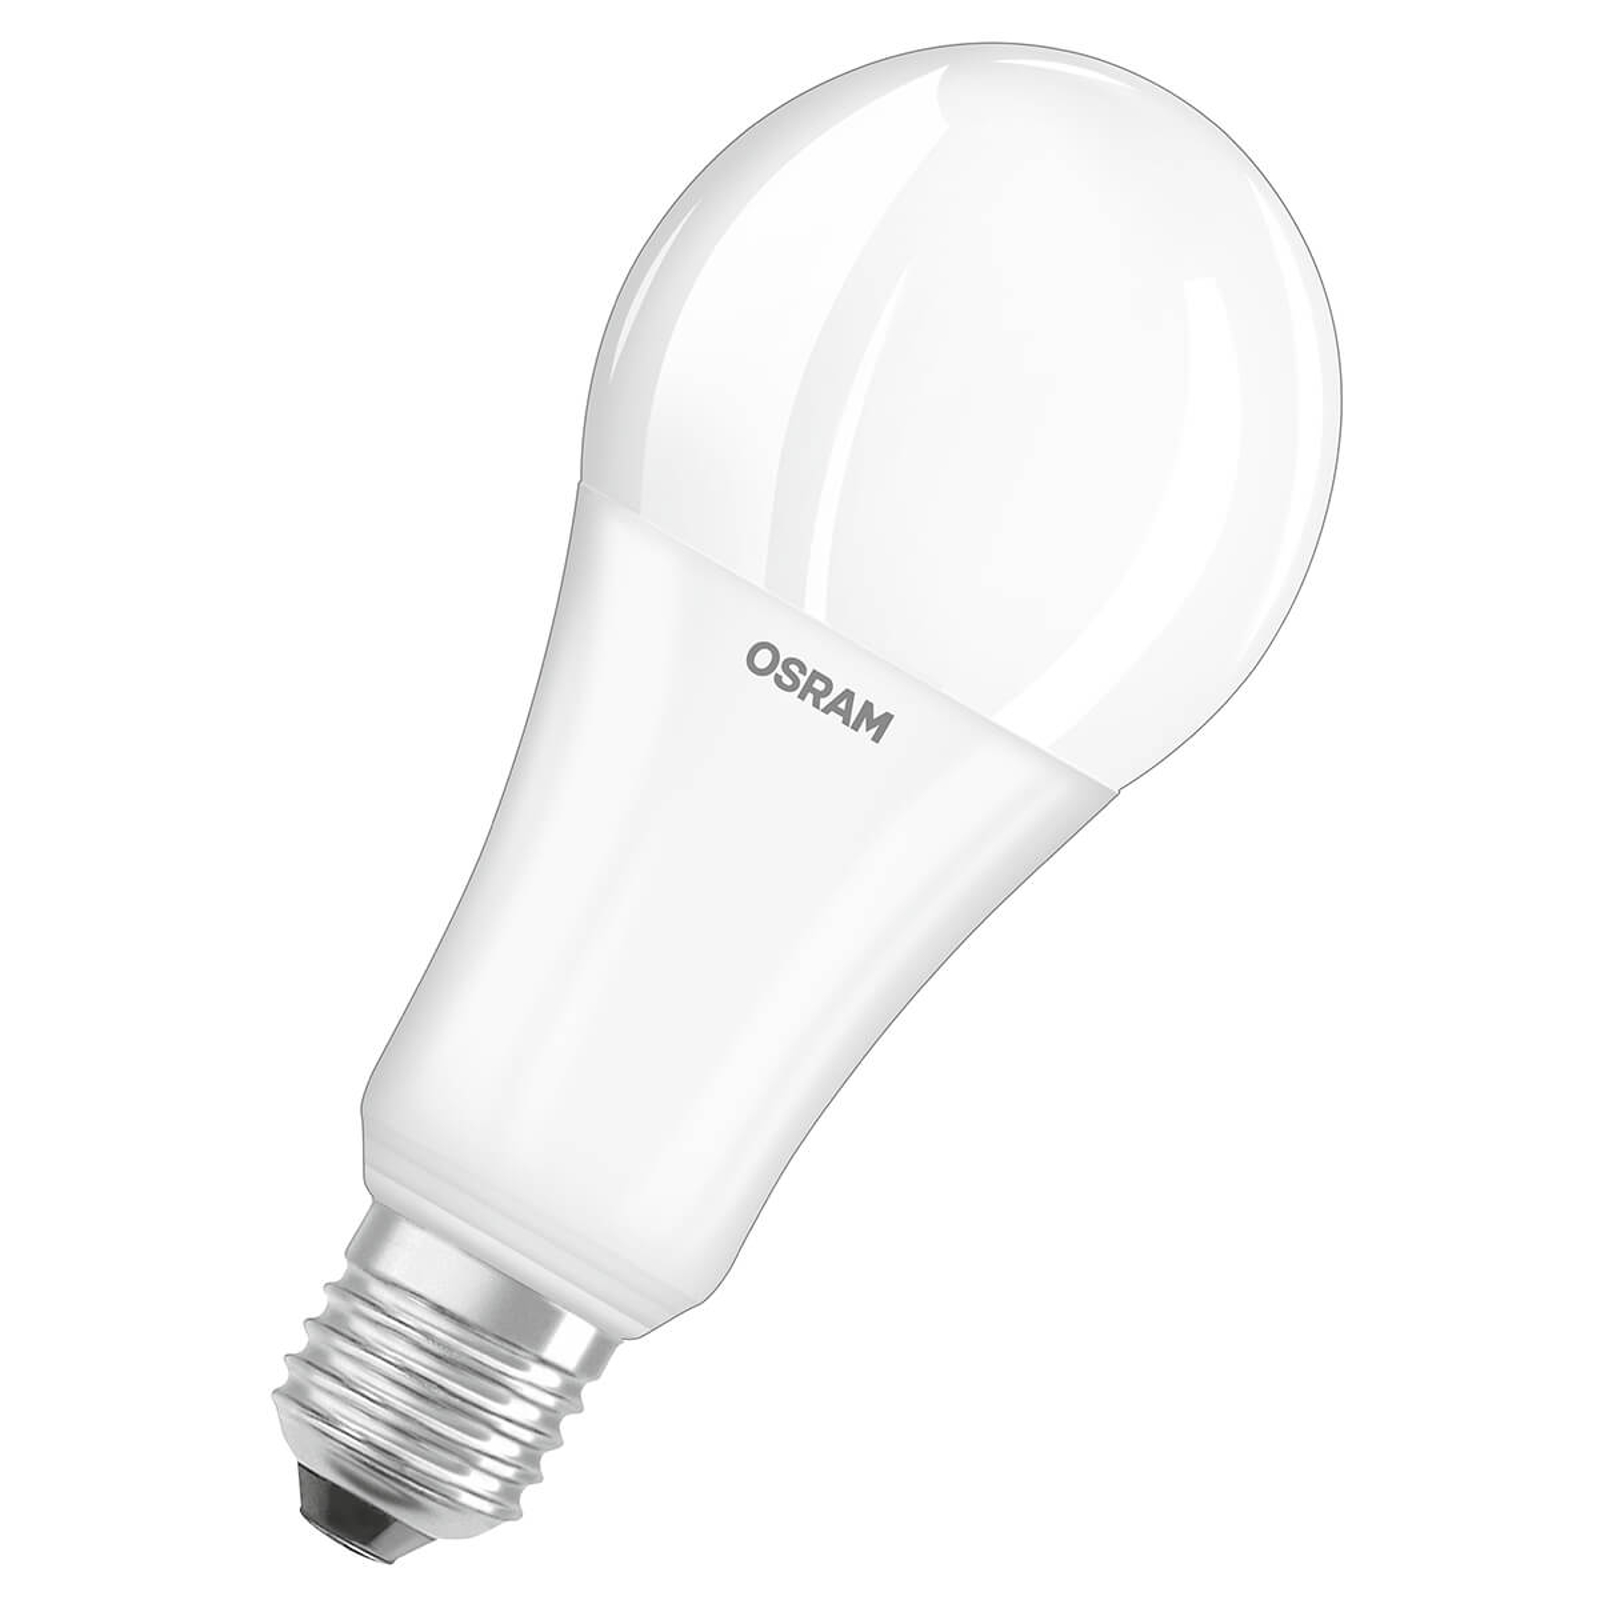 Lampadina LED E27 19W, bianco caldo, 2.452 lumen